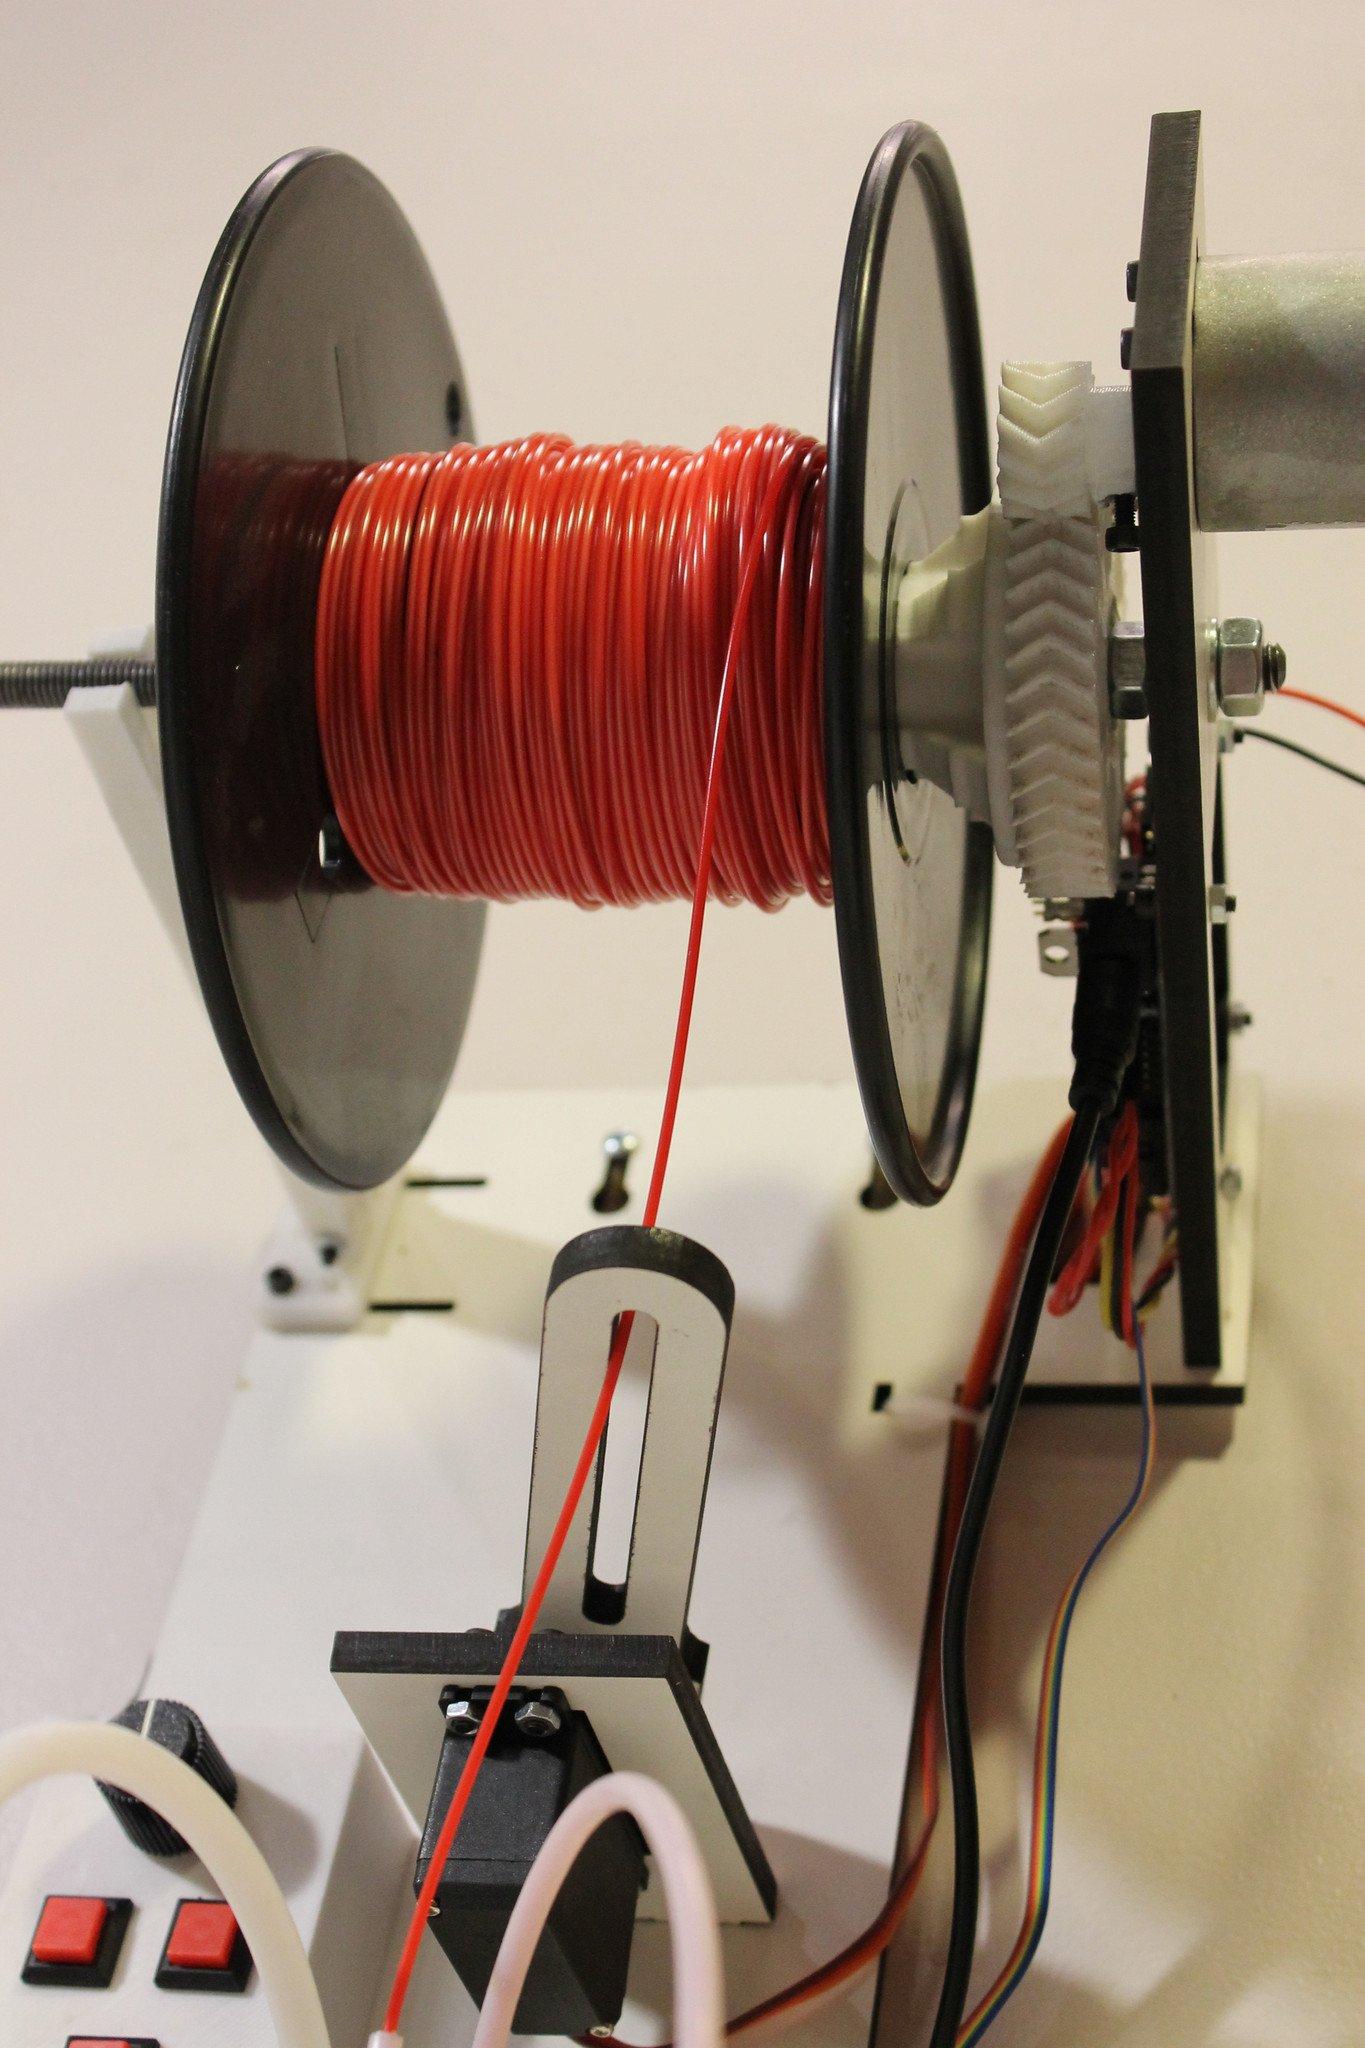 Detalle de guía en filawinder para enrollar filamento impresora 3D